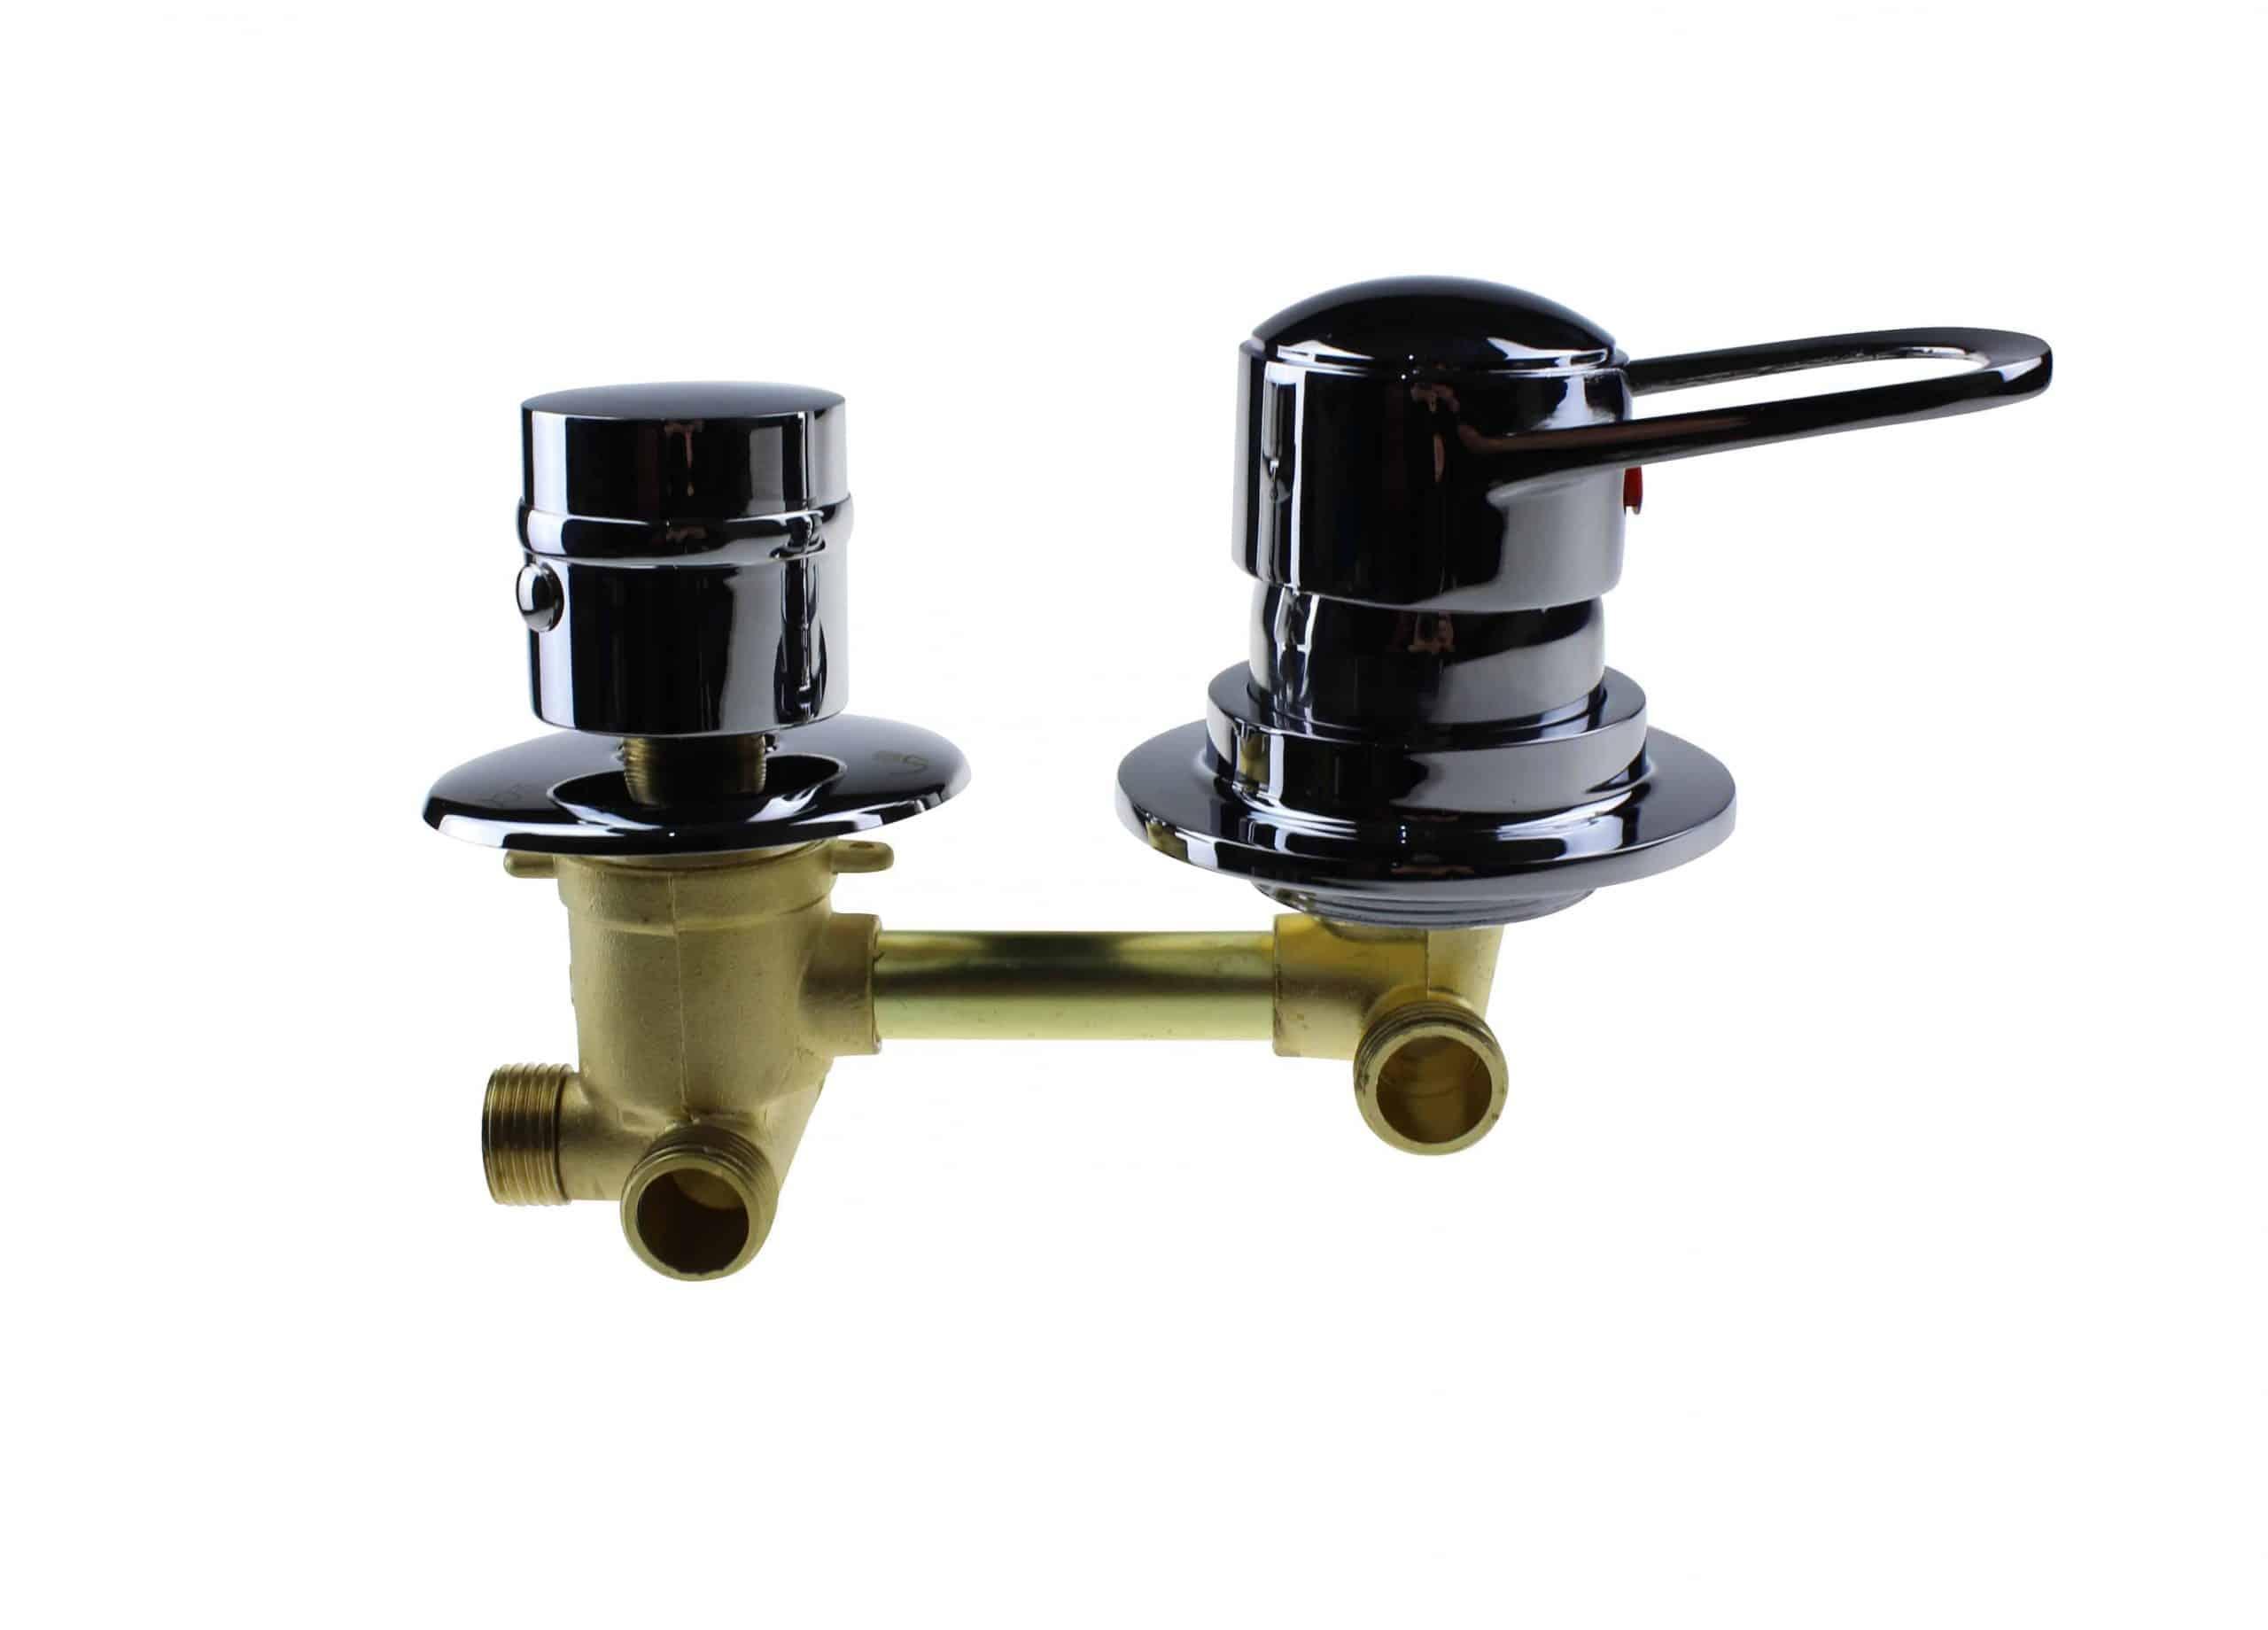 2 Dial Shower Mixer Valve : Threaded 100mm Centres